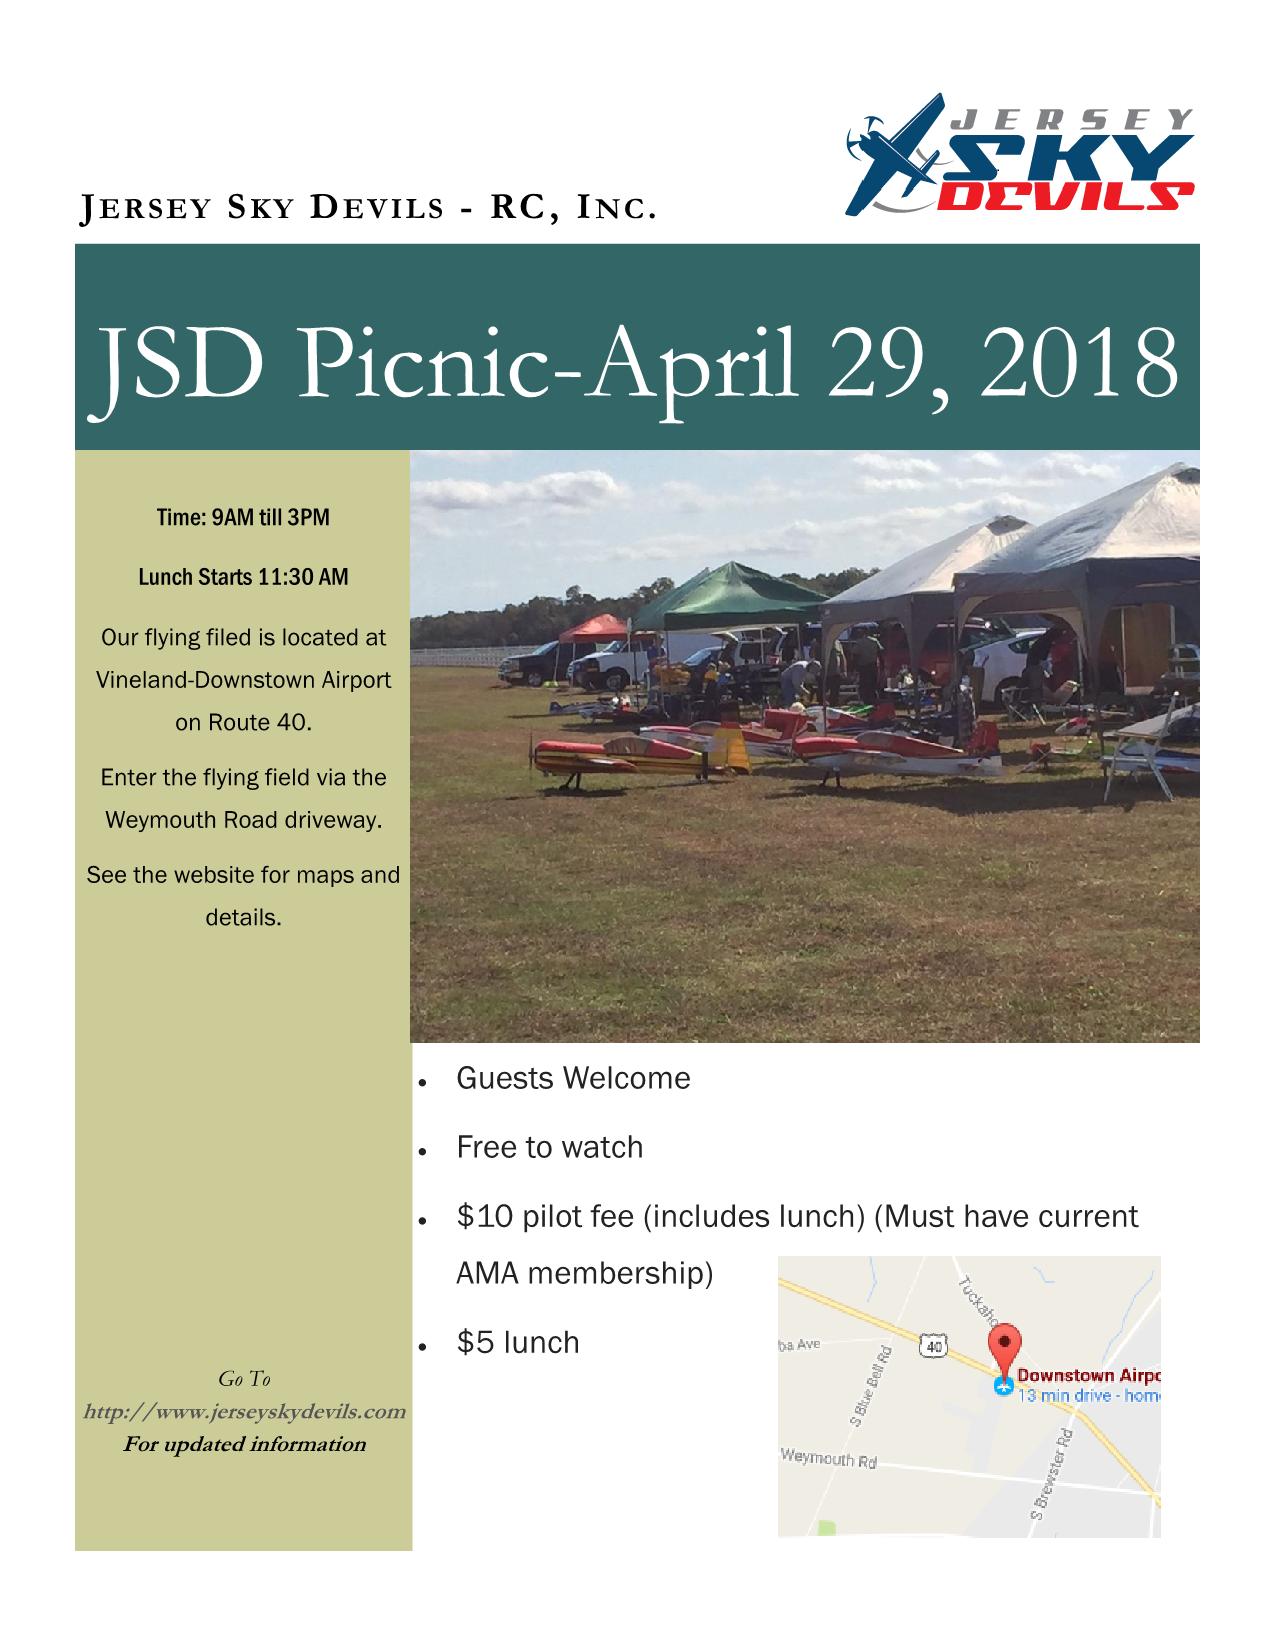 JSD Picnic Flyer 20180429